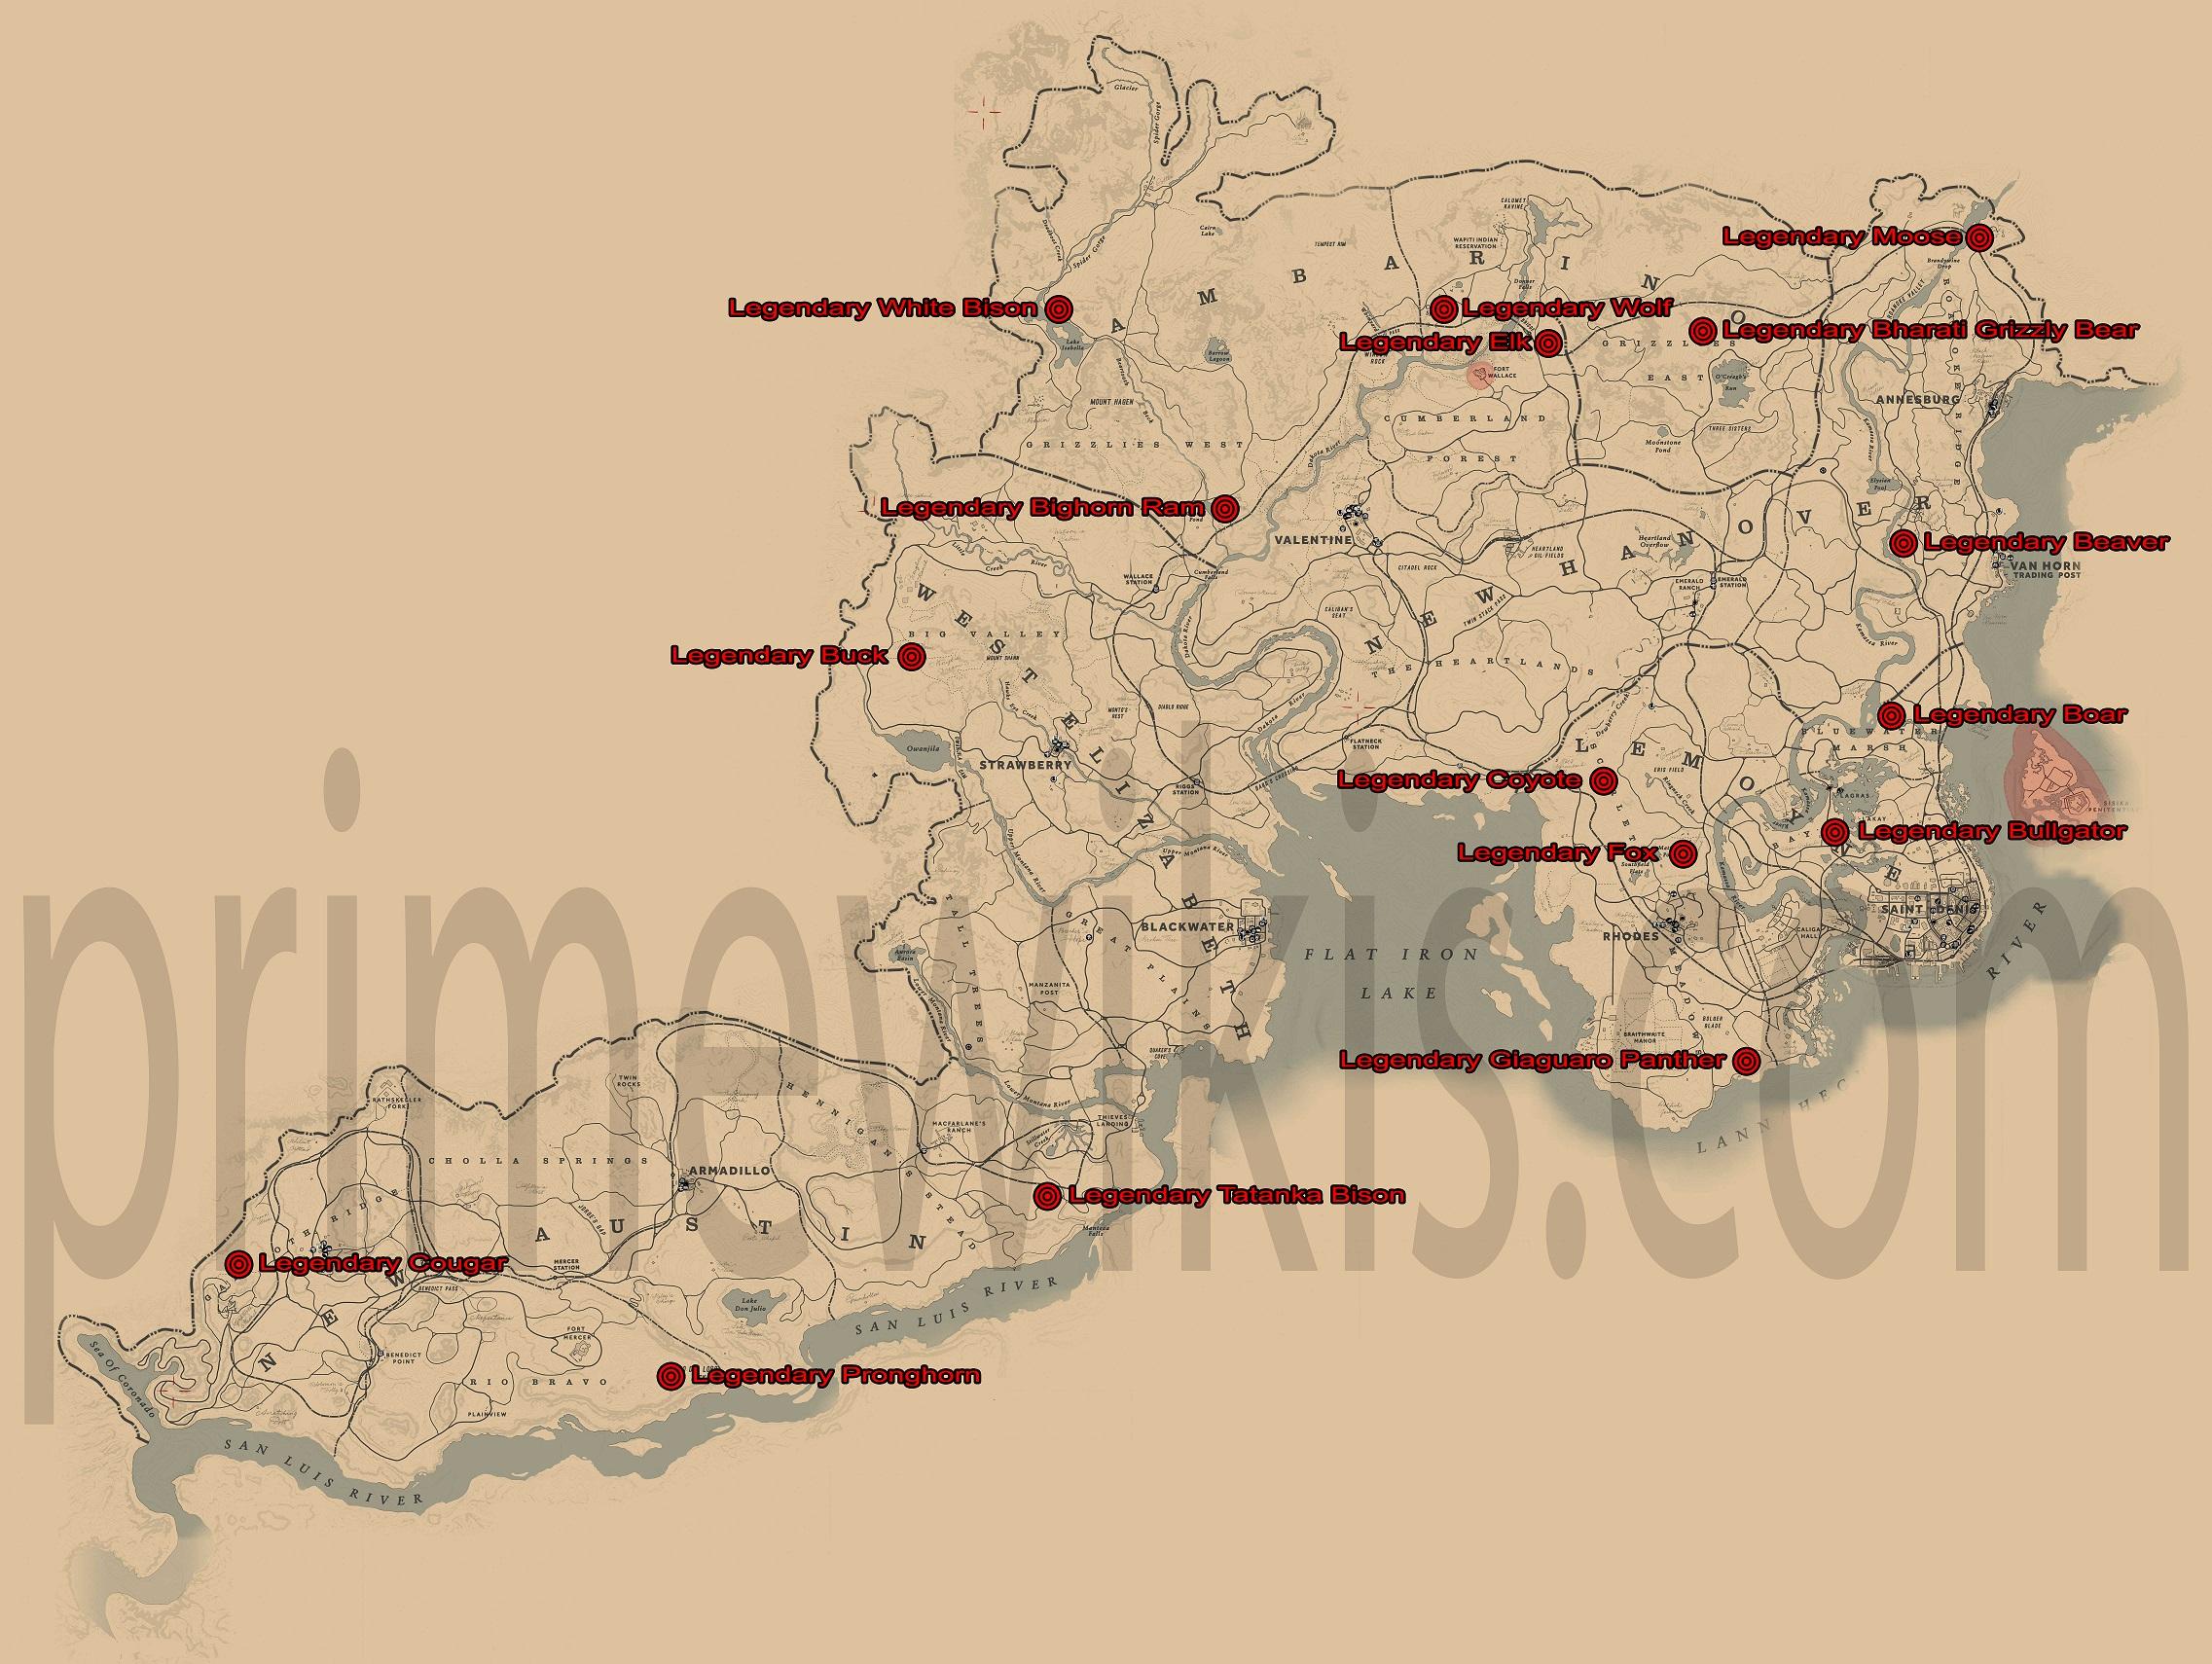 rdr2 legendary animals locations map [ 2273 x 1710 Pixel ]